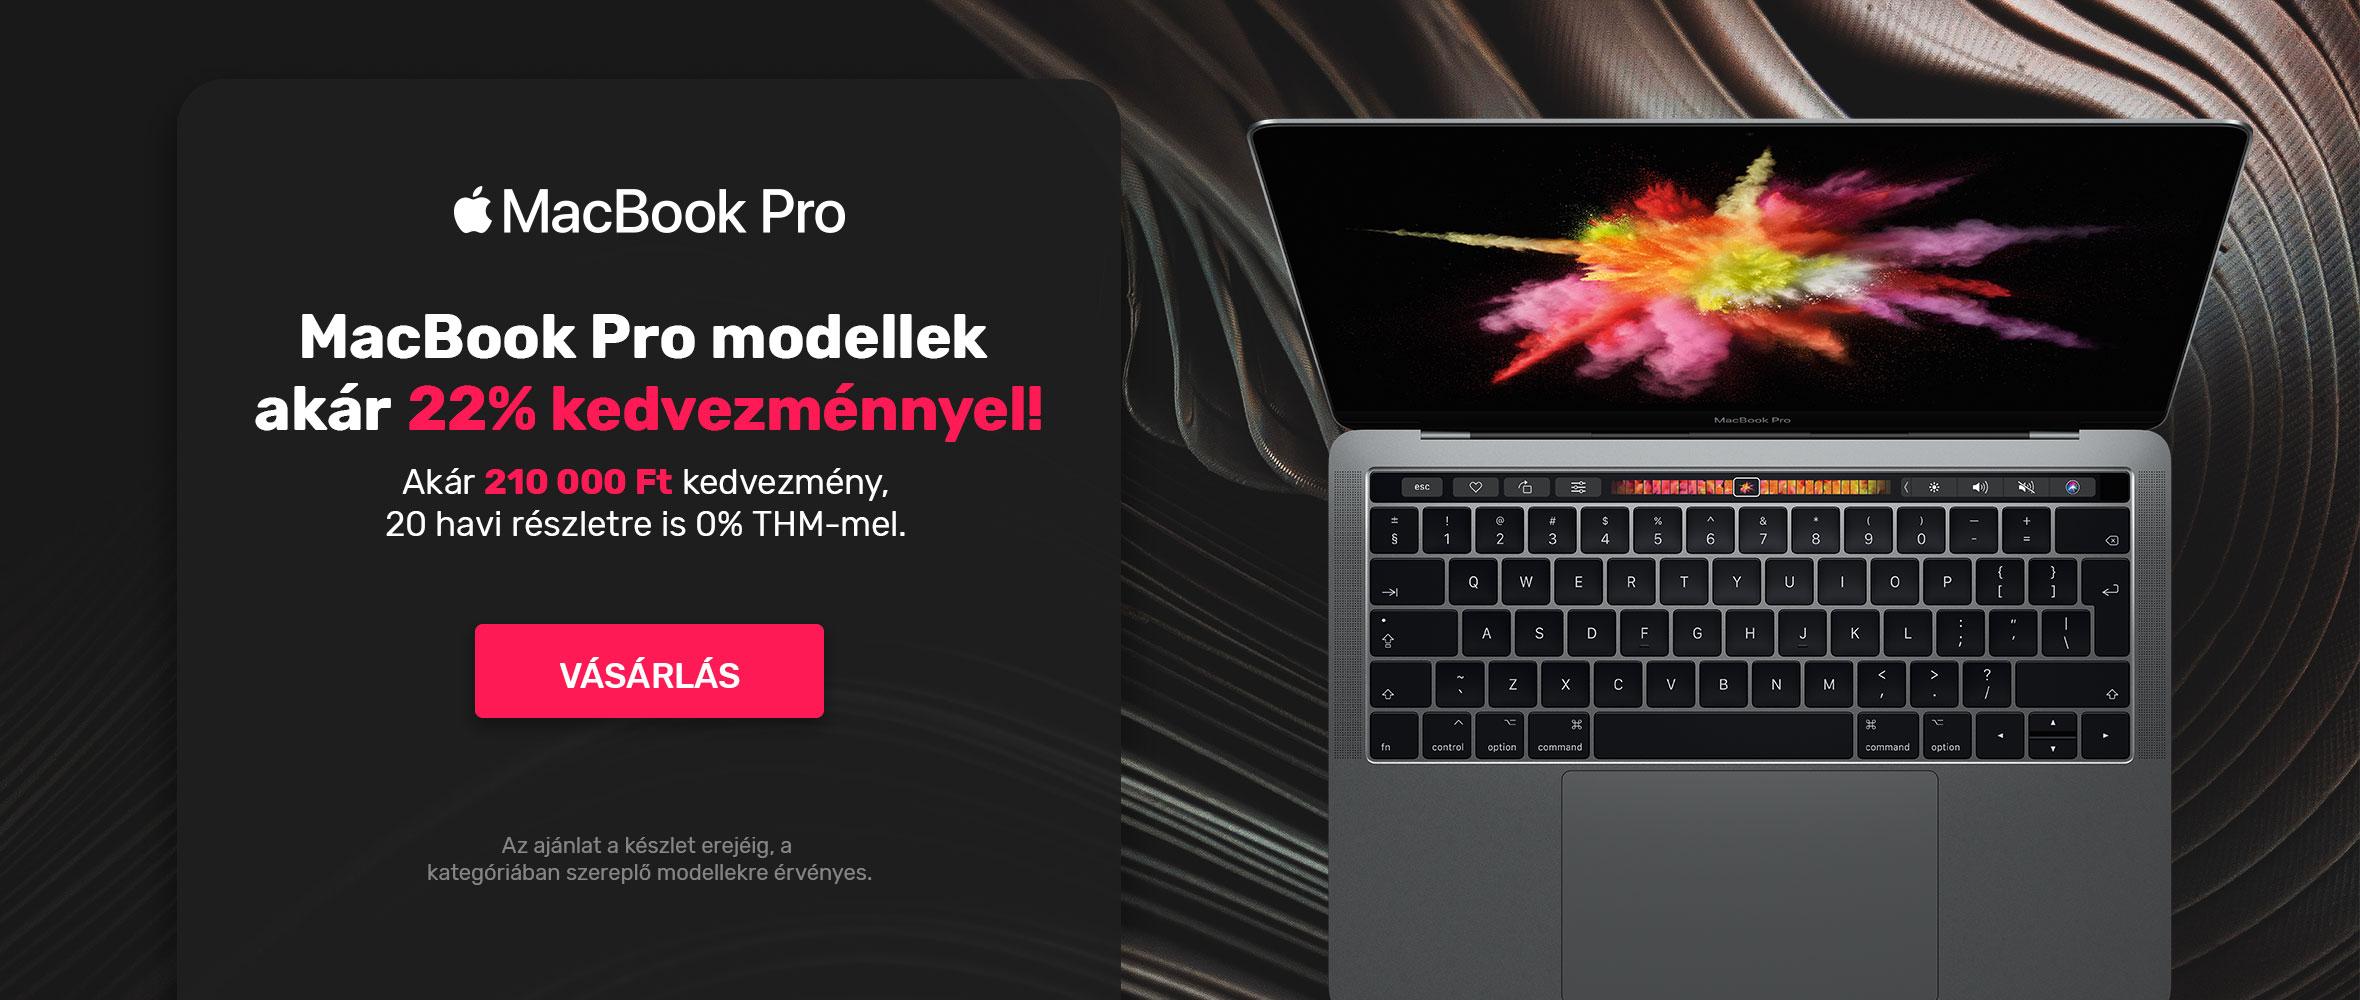 Kifutó Mac modellek